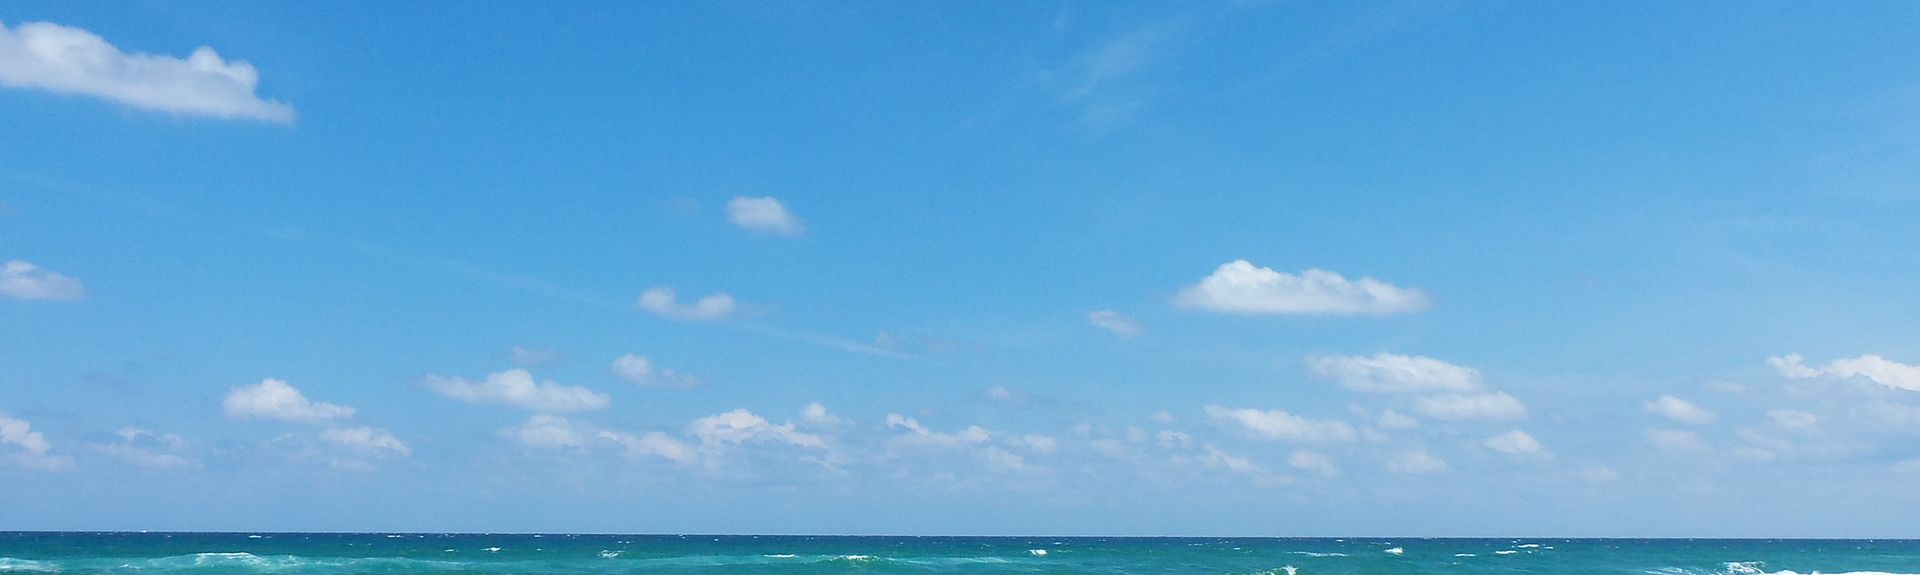 Briny Breezes, Florida, USA